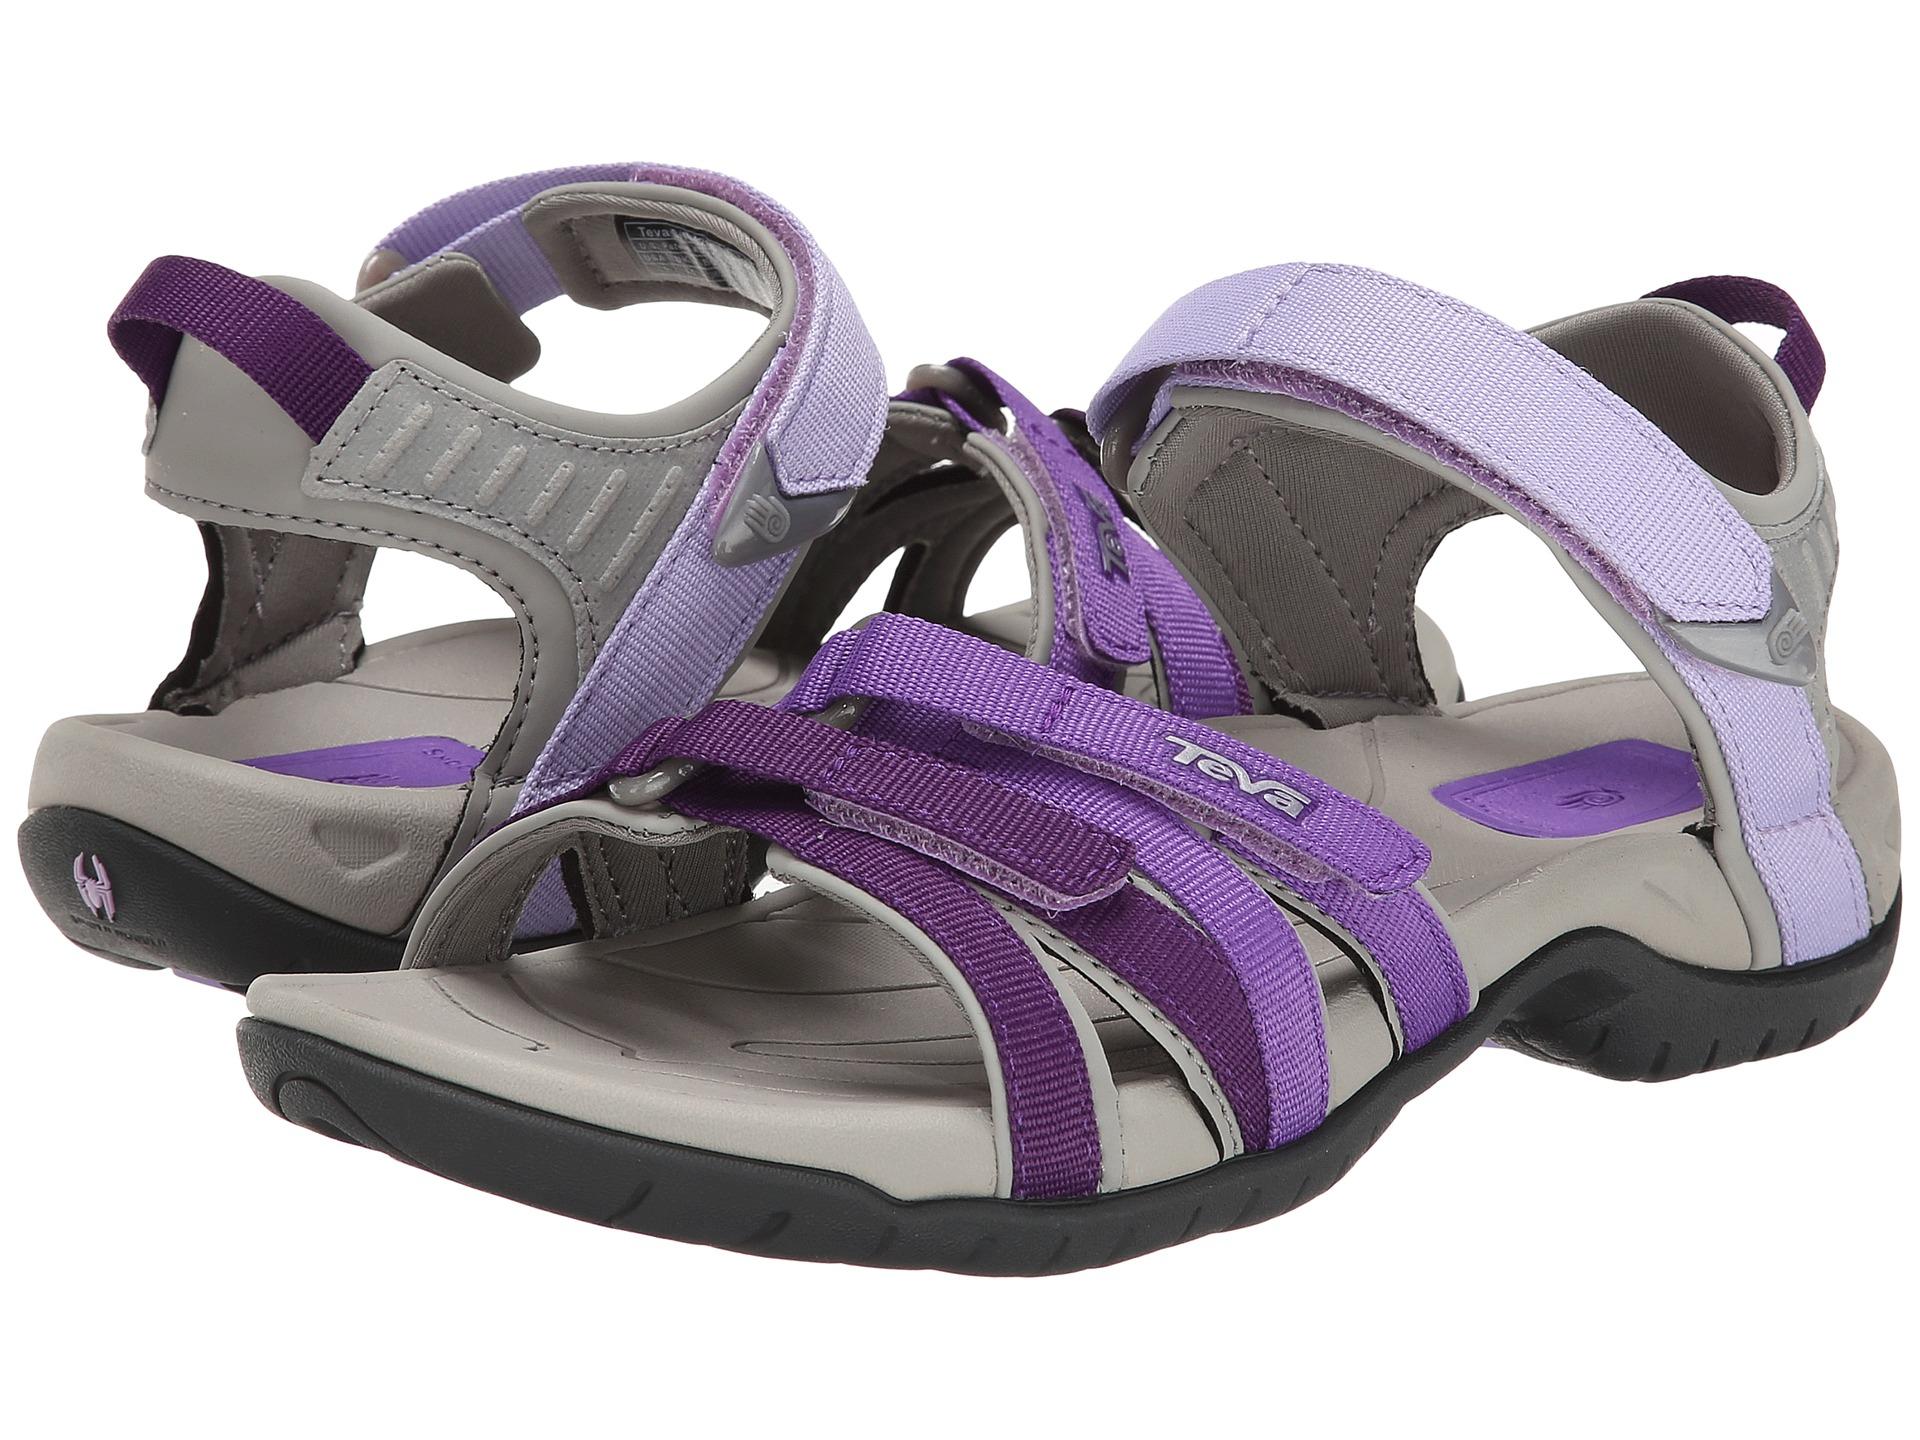 694d69779a9e Lyst - Teva Tirra in Purple